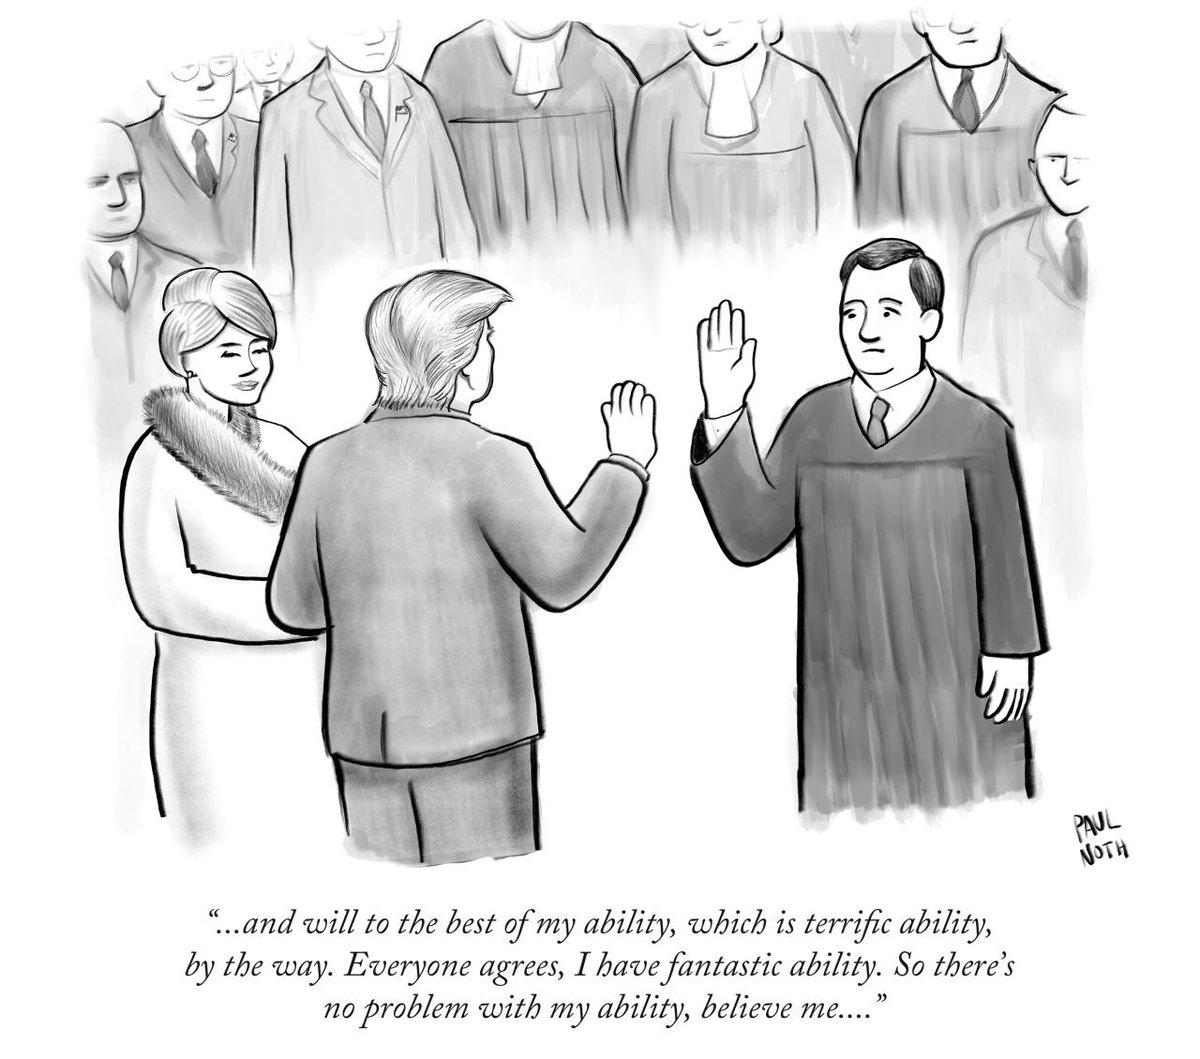 This @NewYorker cartoon is fantastic.  #TrumpPresident https://t.co/R1QcwkPa6x